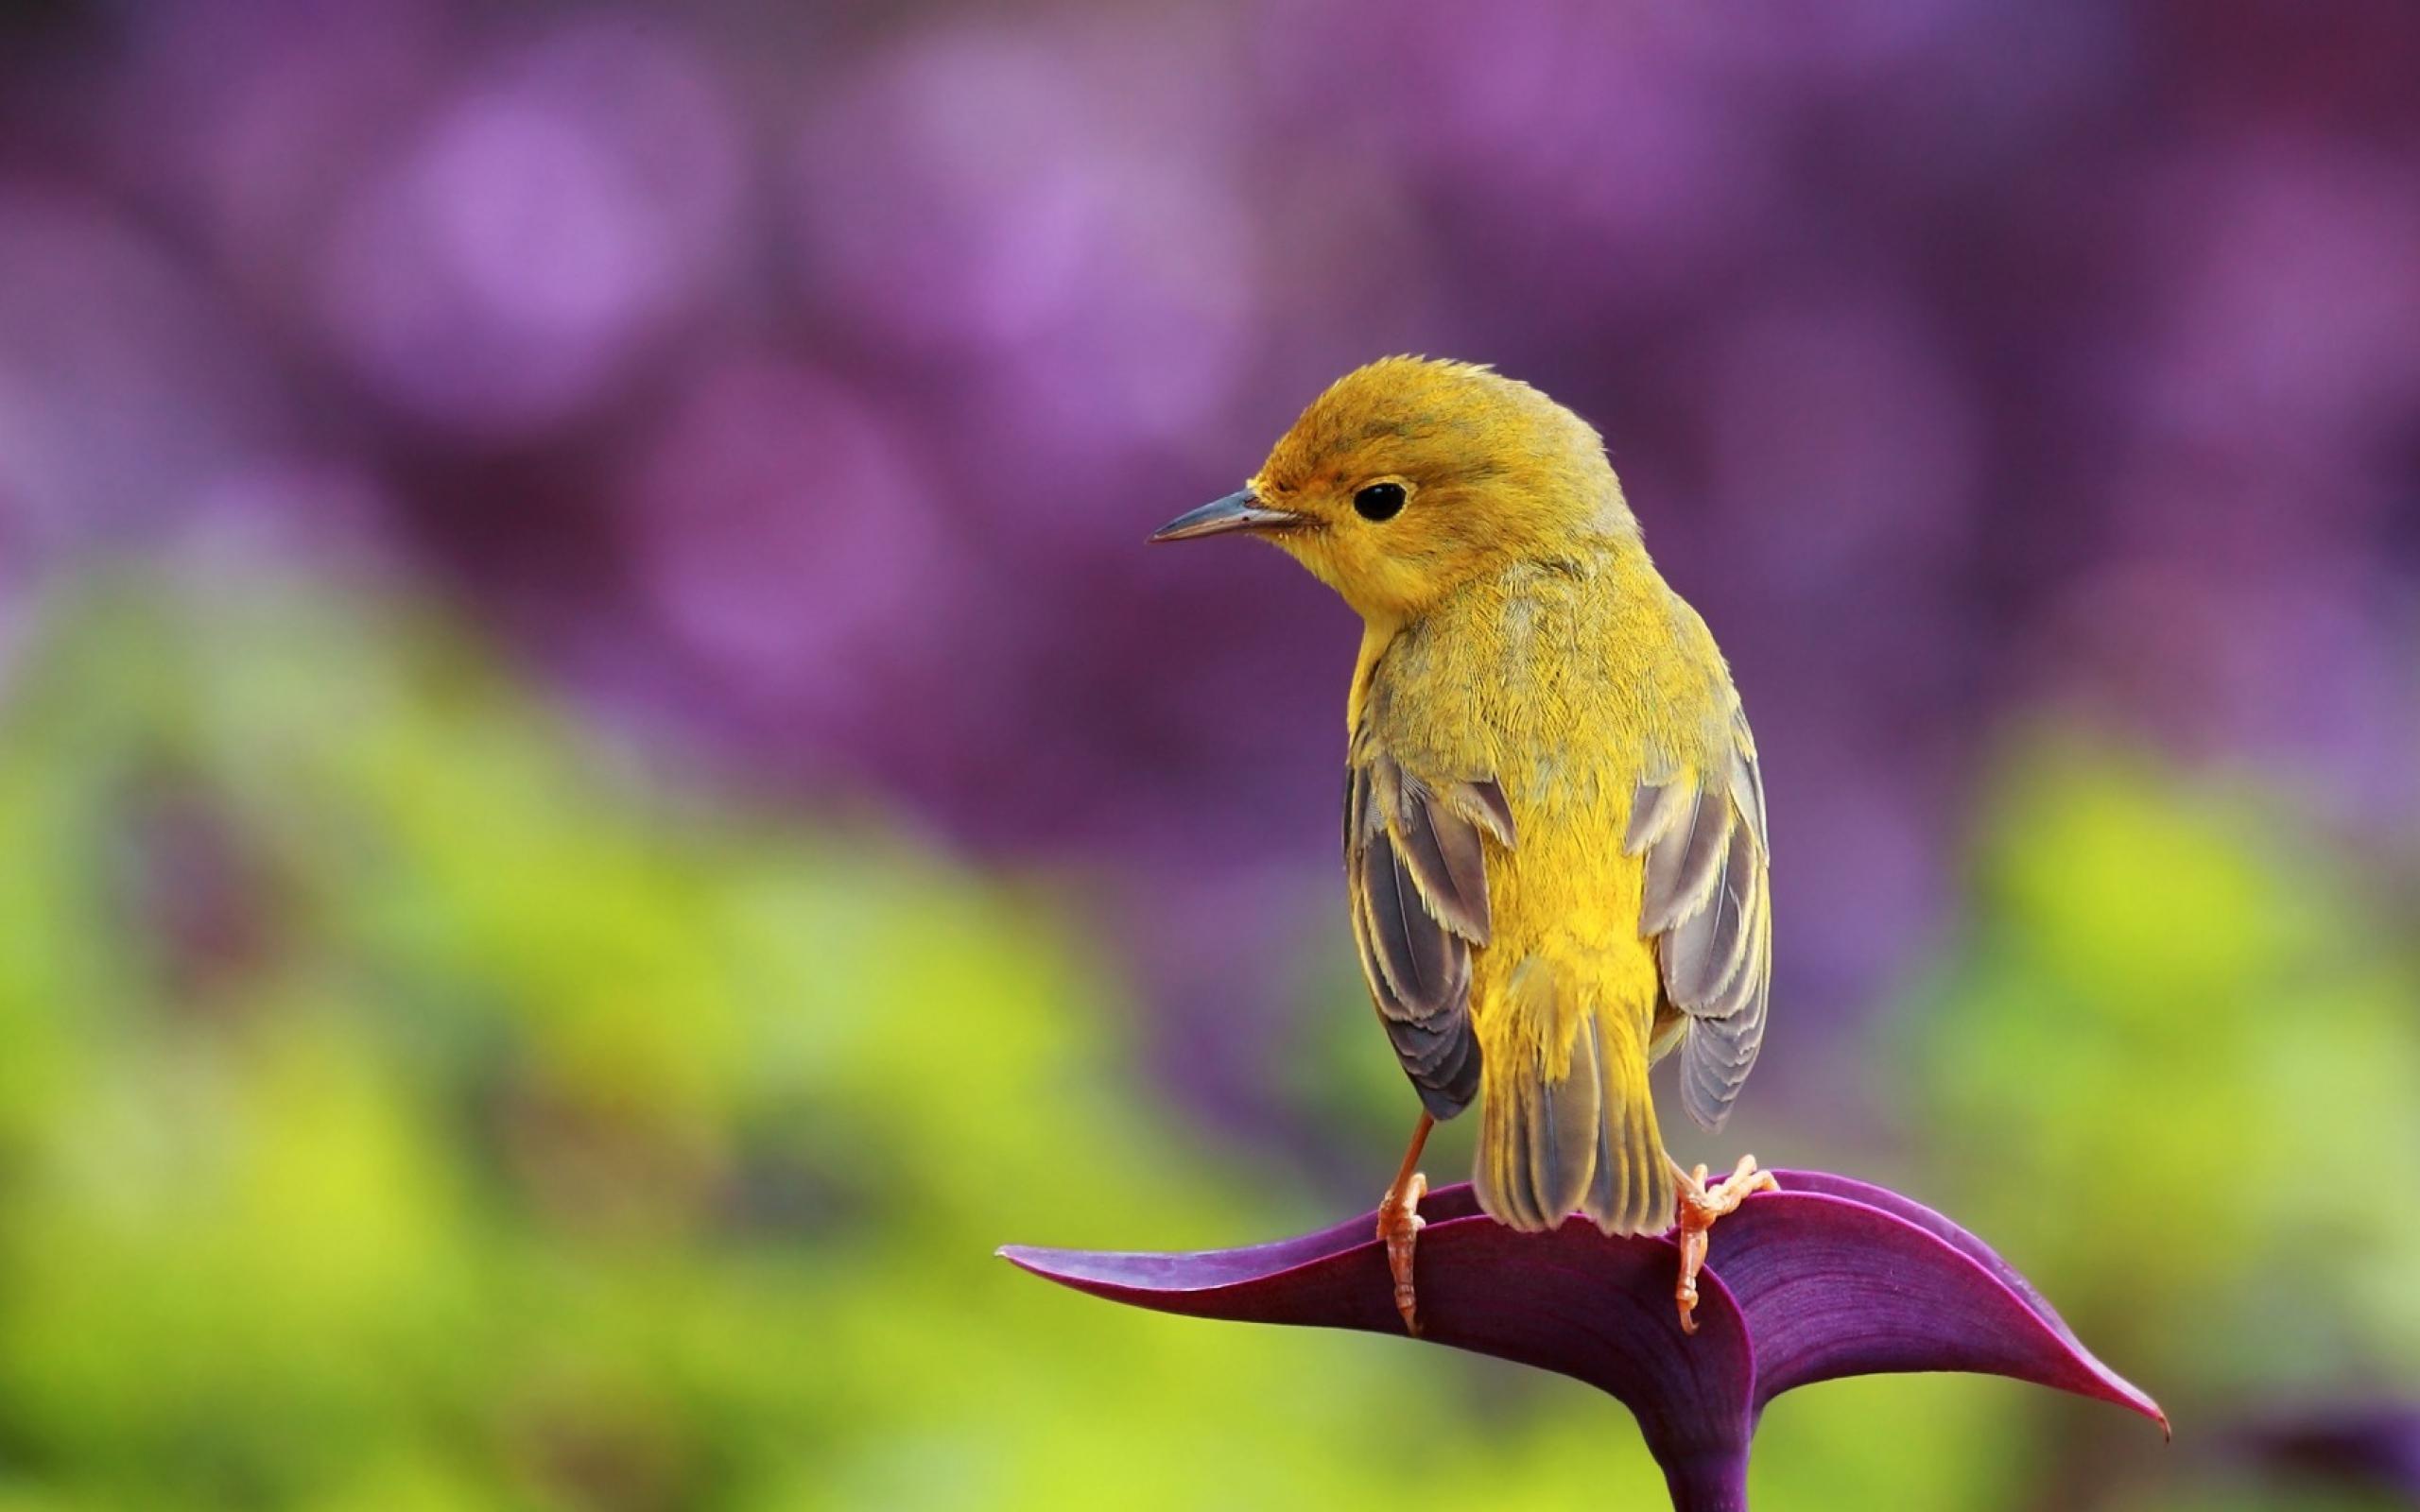 بالصور صور عصافير , اجمل صور عصافير ملونه 5696 5